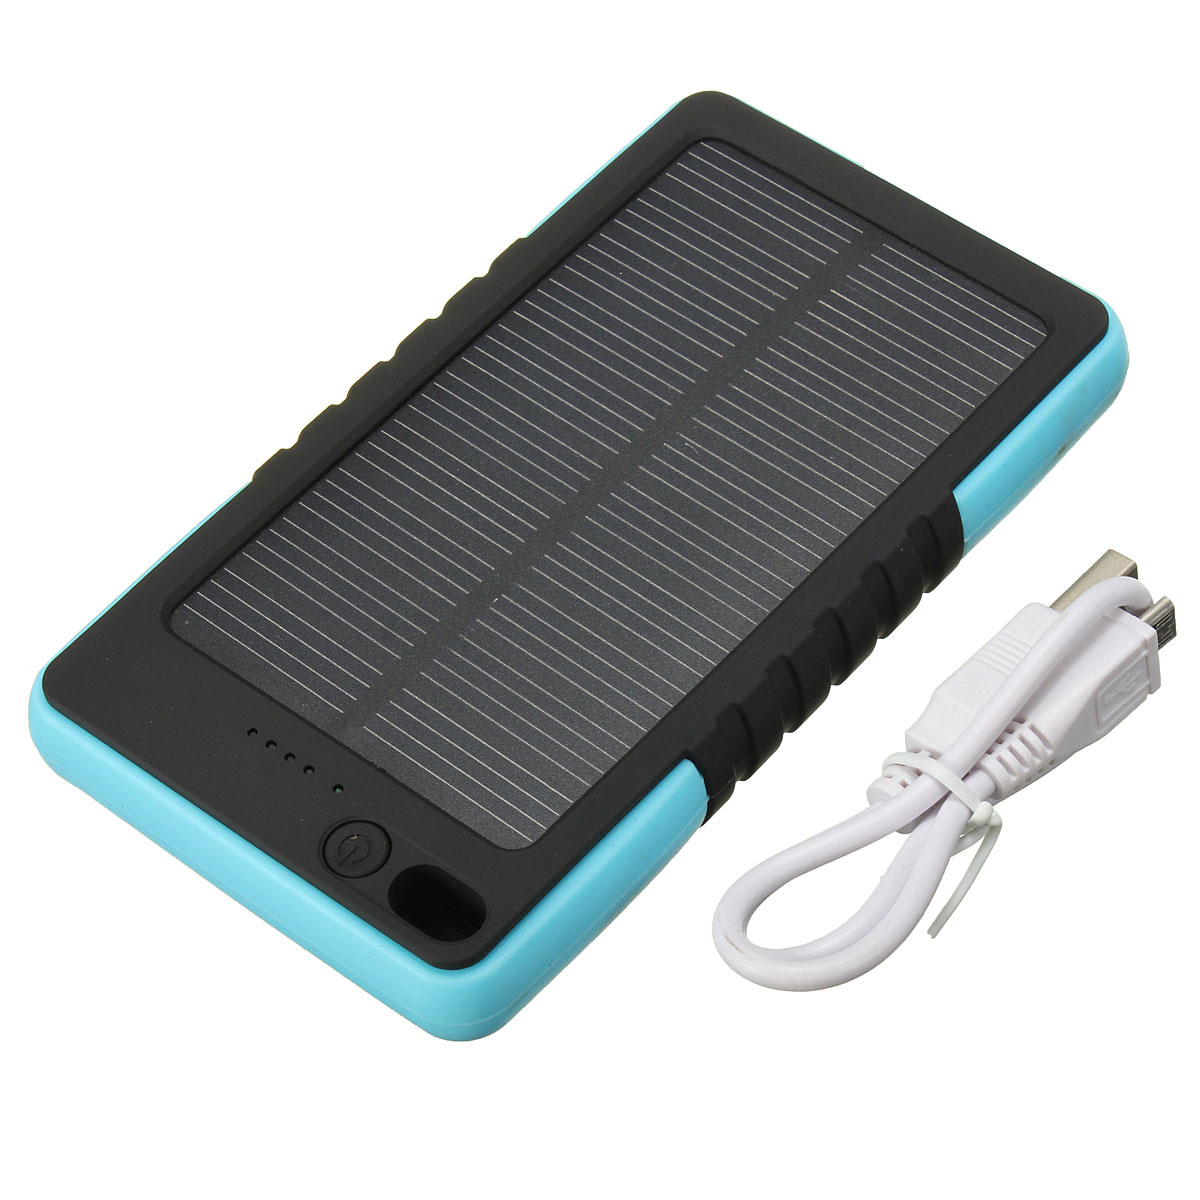 solar power bank 8000mah akku ladeger t outdoor. Black Bedroom Furniture Sets. Home Design Ideas